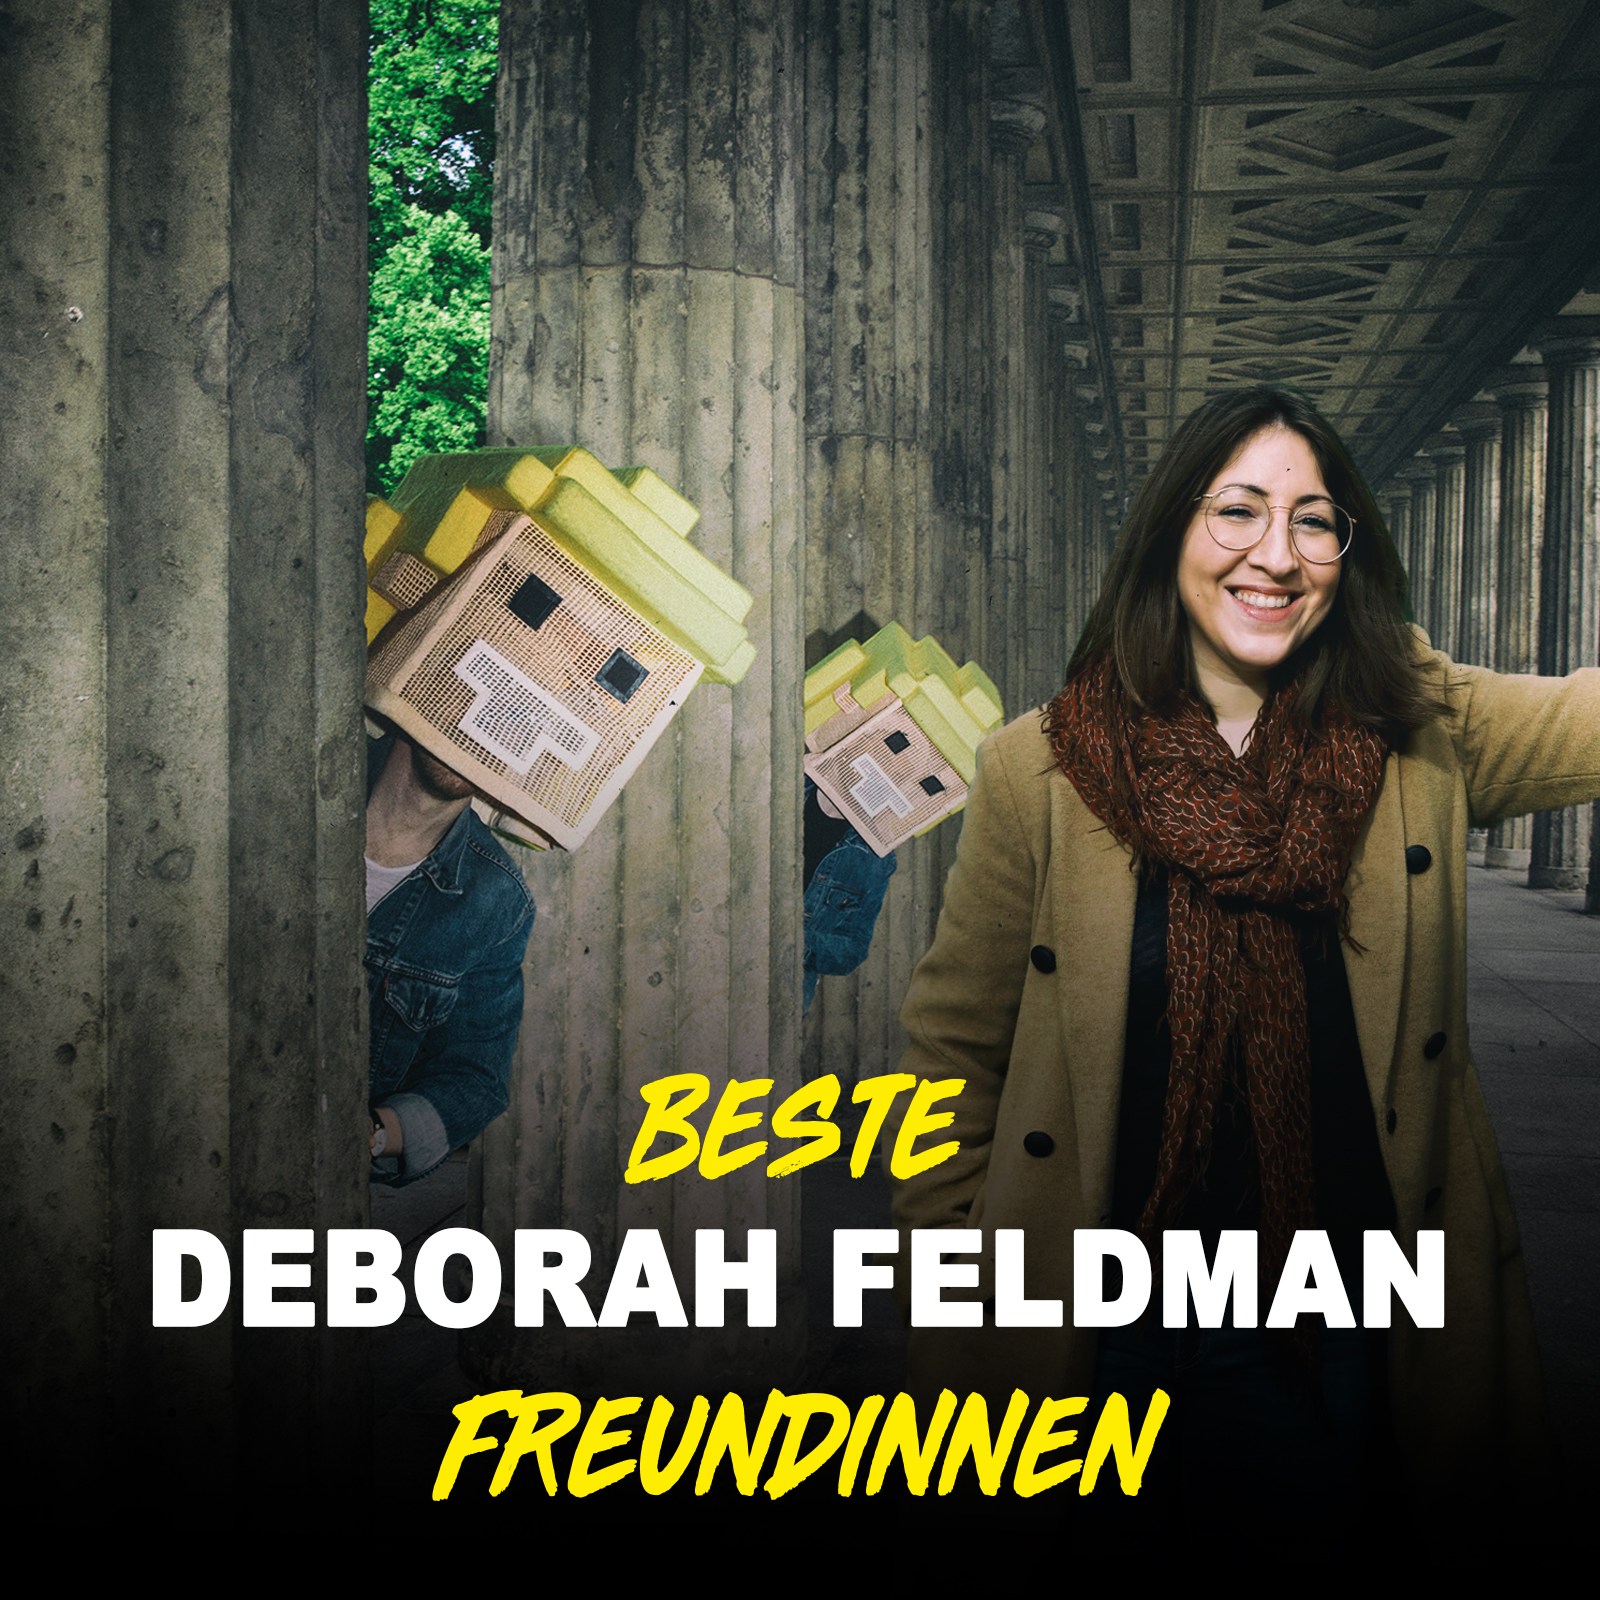 Deborah Feldman bei den Besten Freundinnen